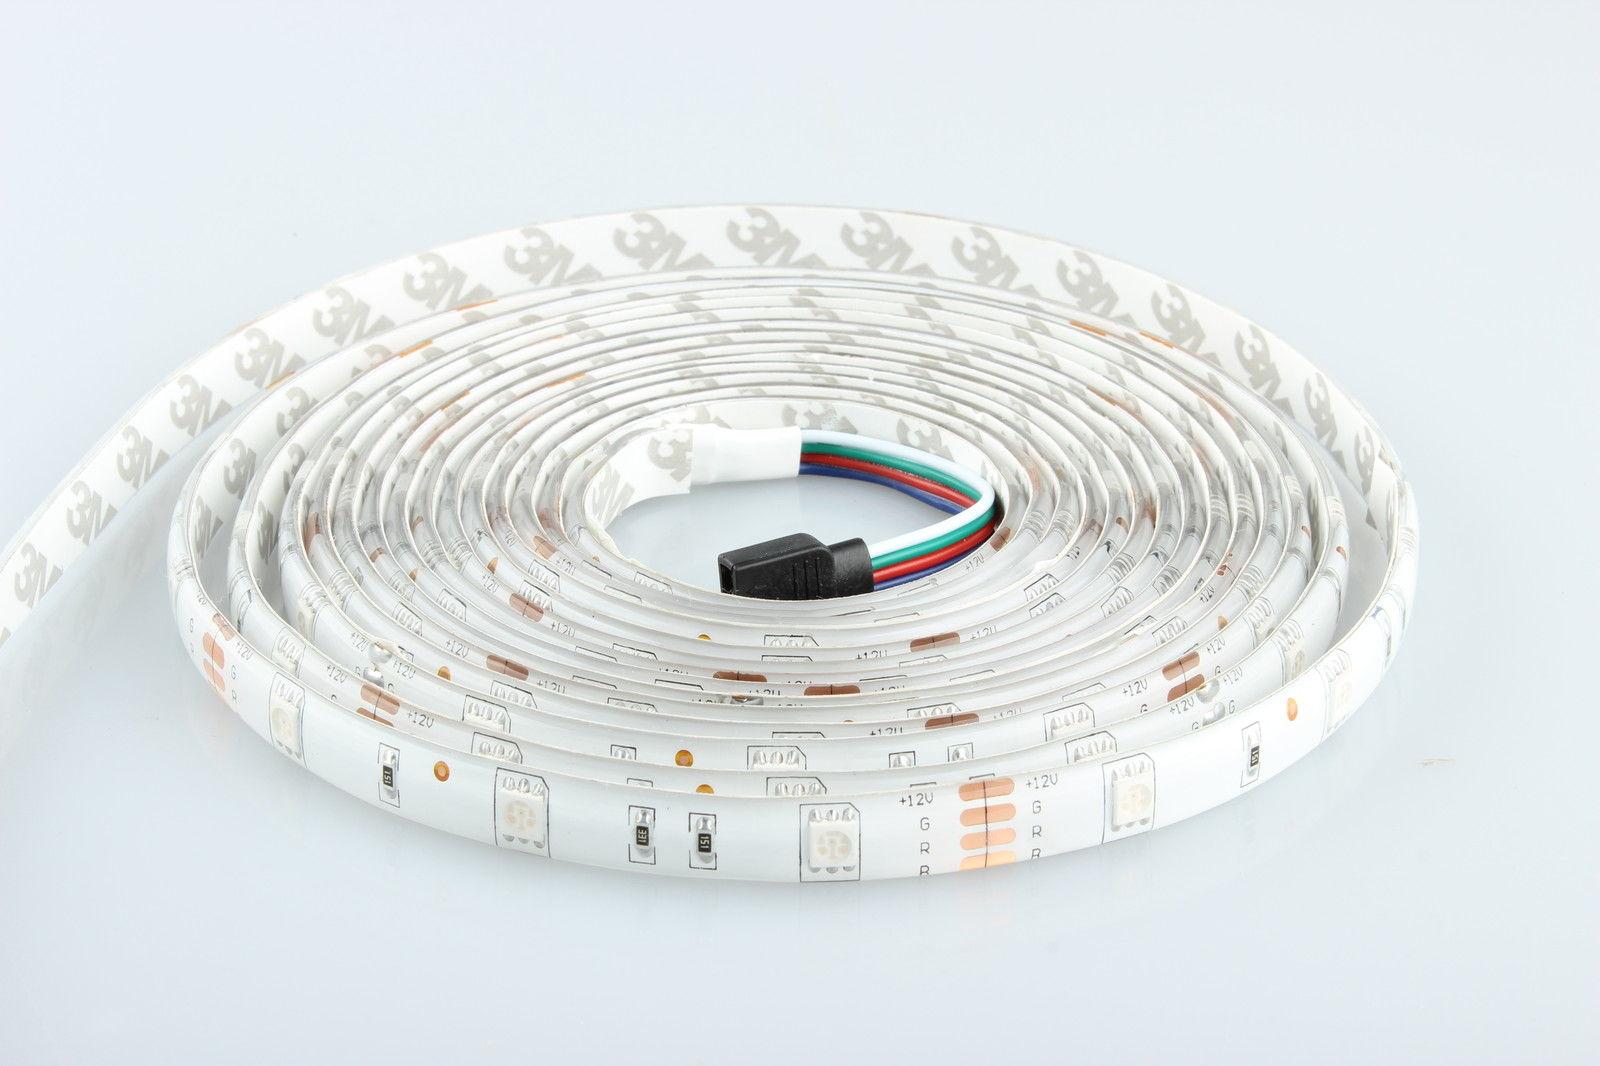 ninetec flash30 5m led band strip e kette schlauch licht wasserdicht ebay. Black Bedroom Furniture Sets. Home Design Ideas